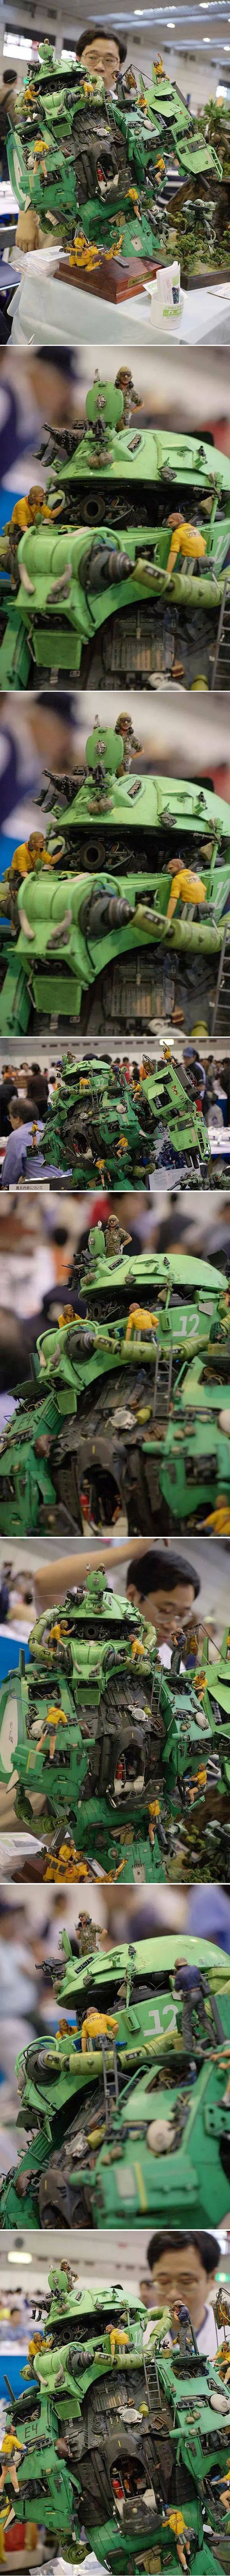 1/24 Zaku 2 Mechanics full Scrath